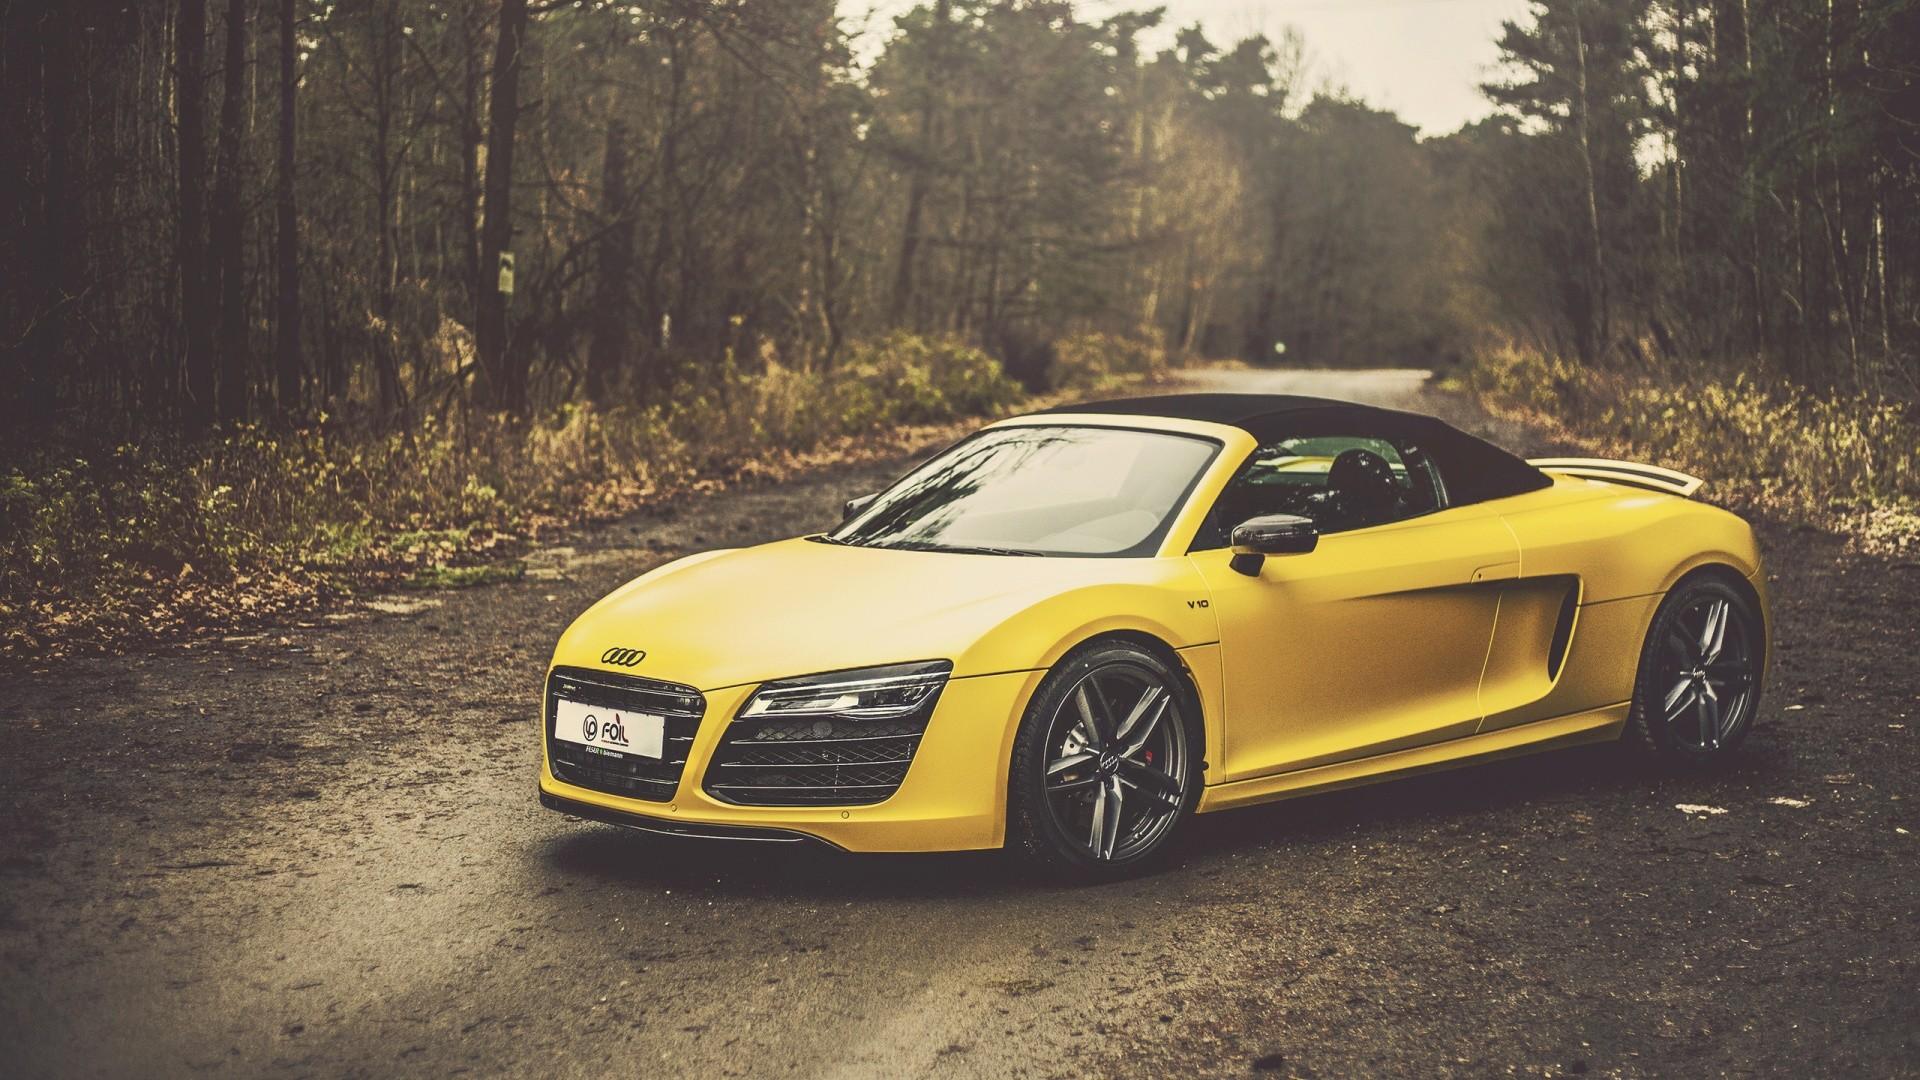 Audi R8 Wallpaper Hd 79 Images